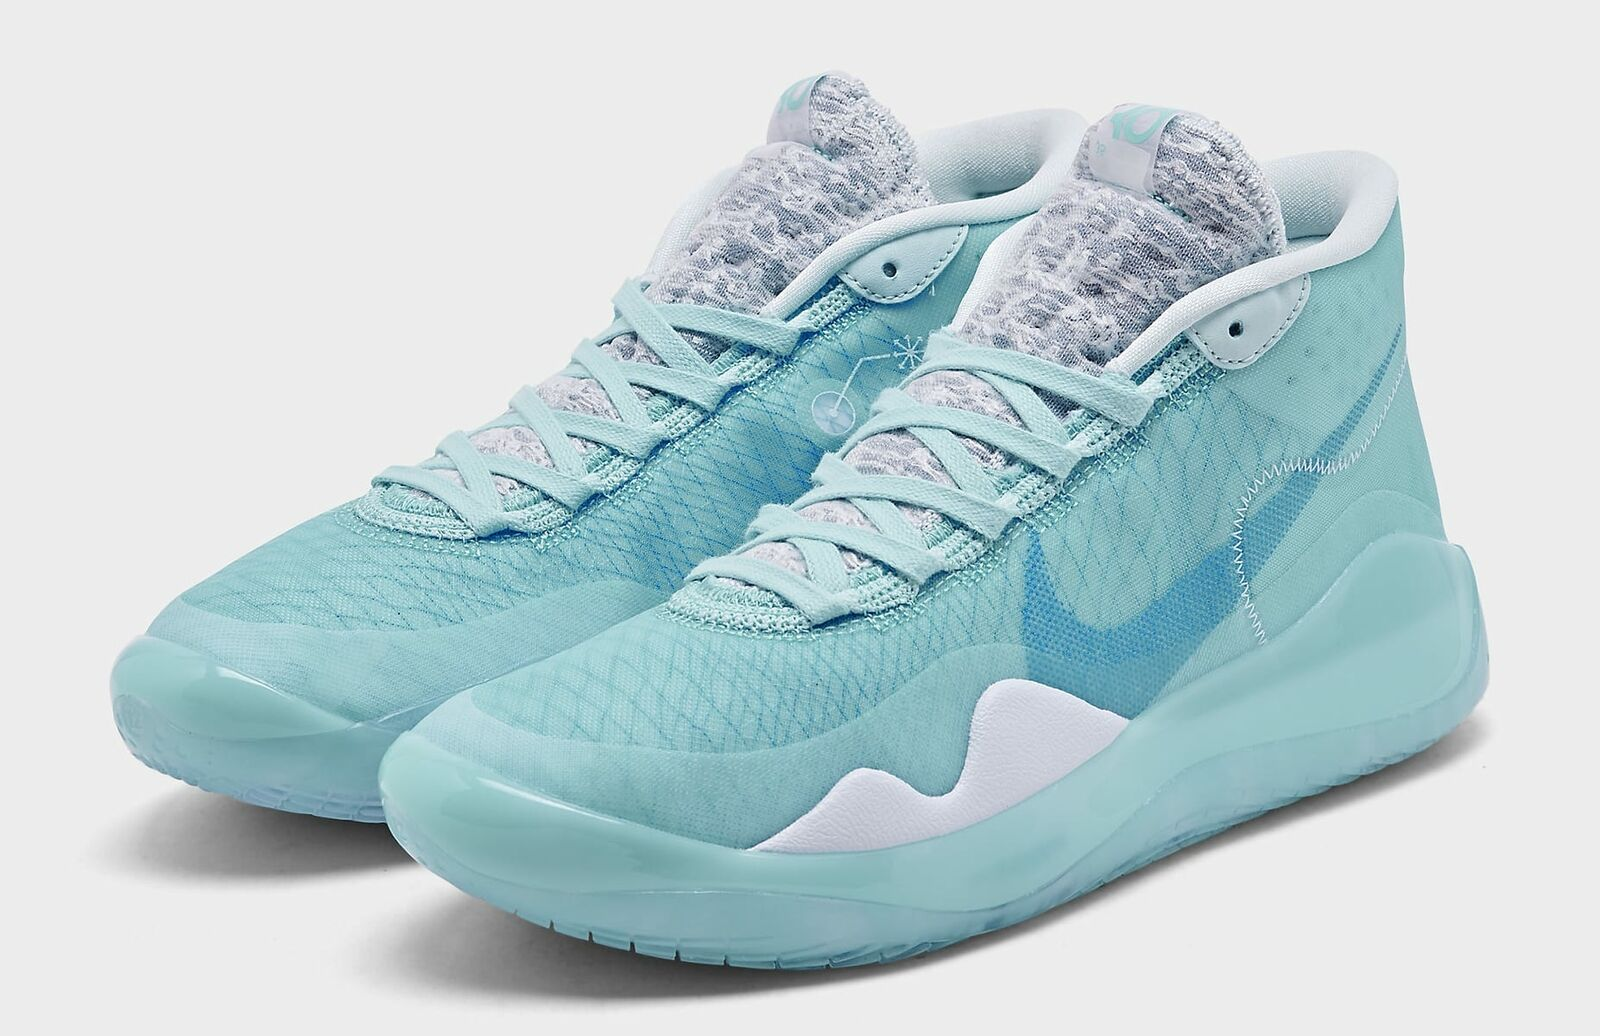 Nike KD 12 Blue Glaze